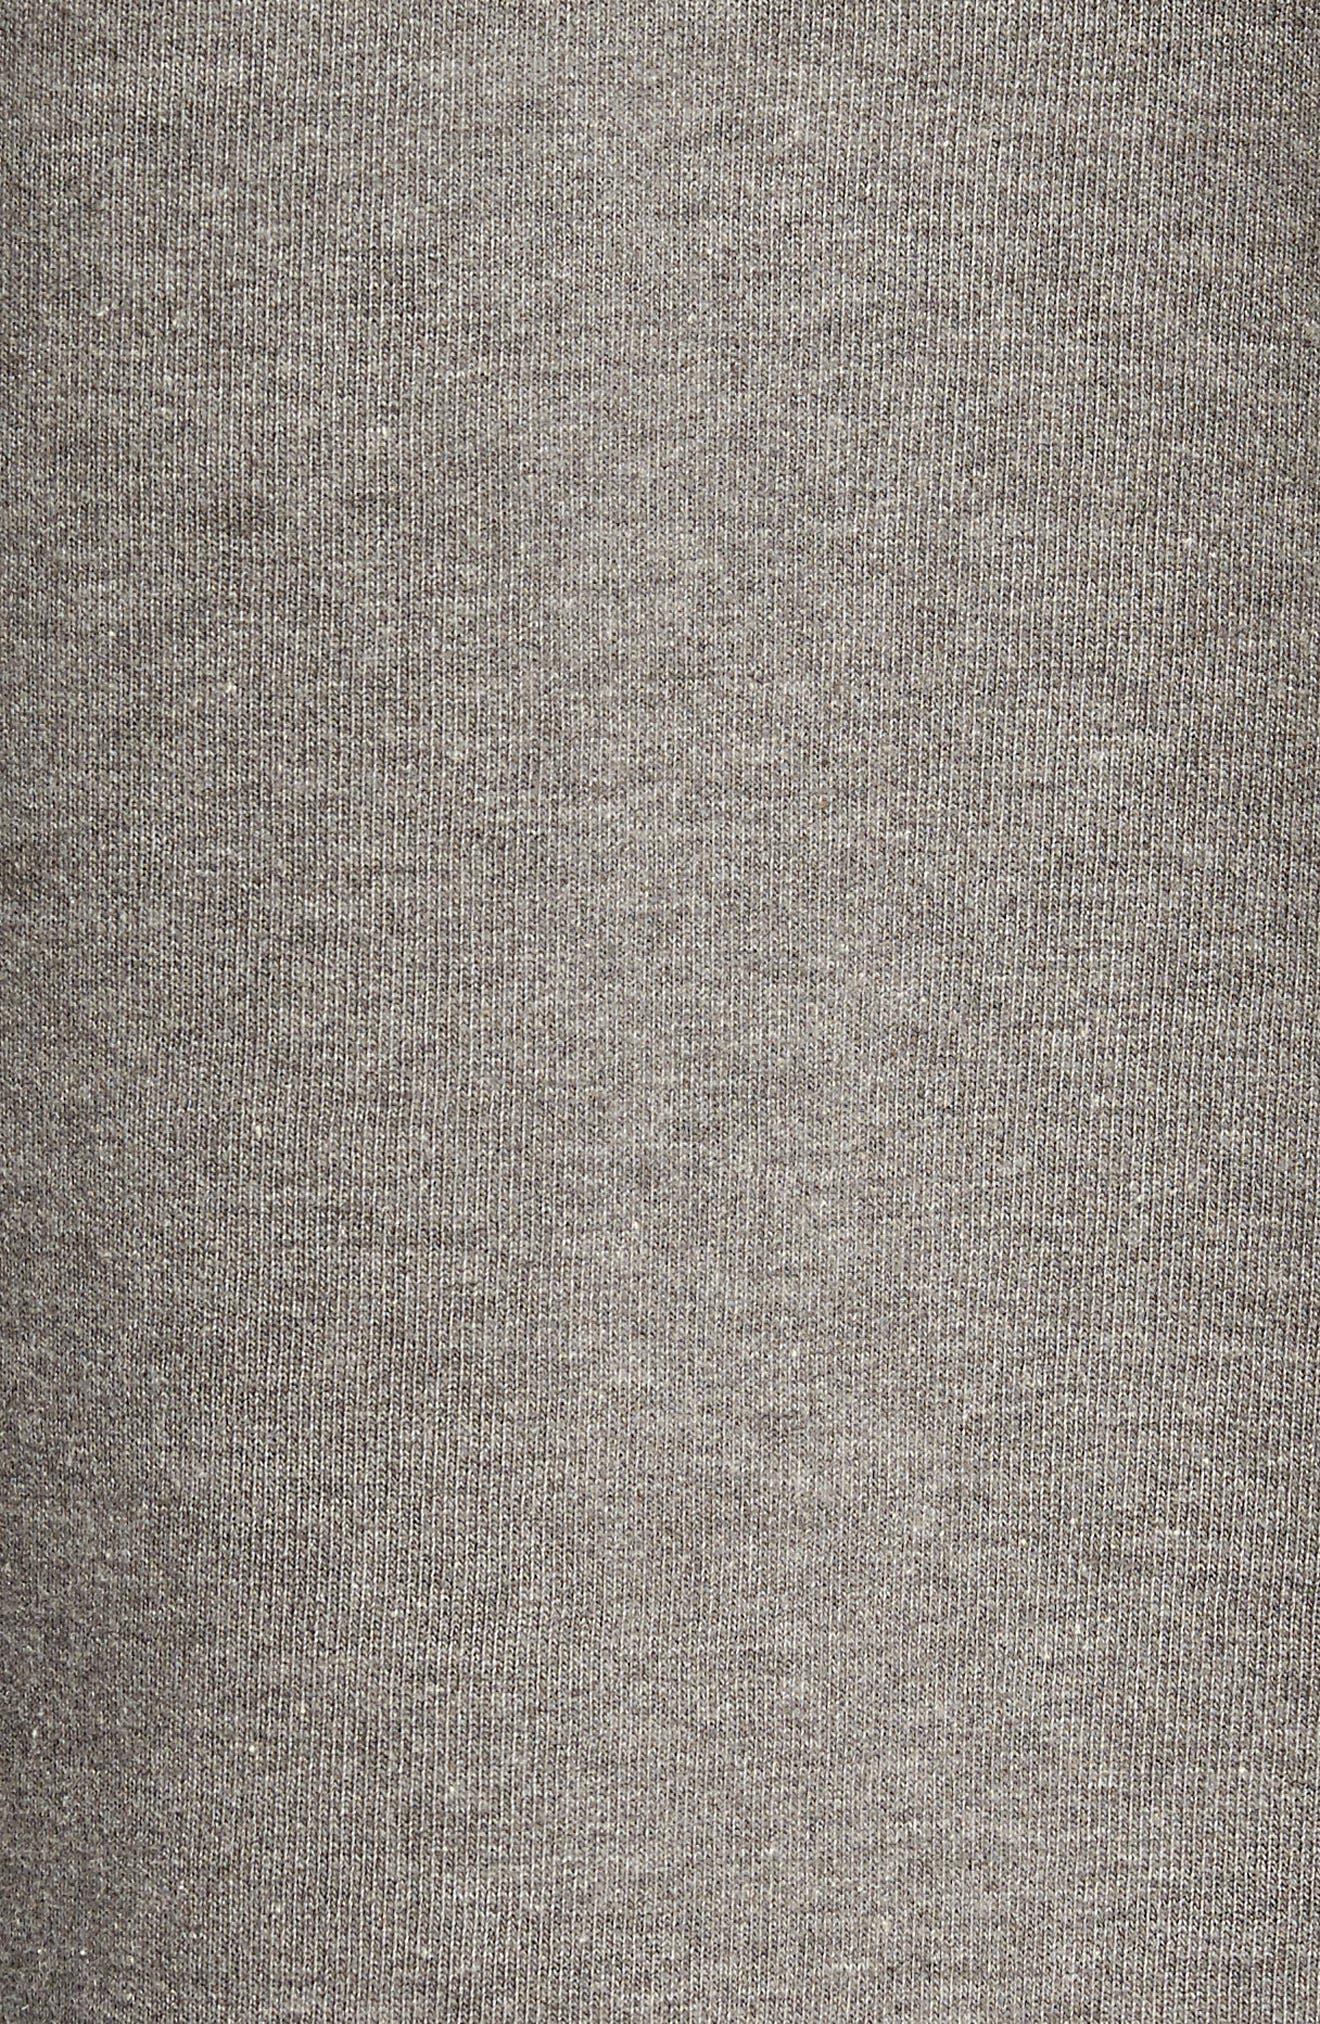 B-Side Reversible Crewneck Sweatshirt,                             Alternate thumbnail 30, color,